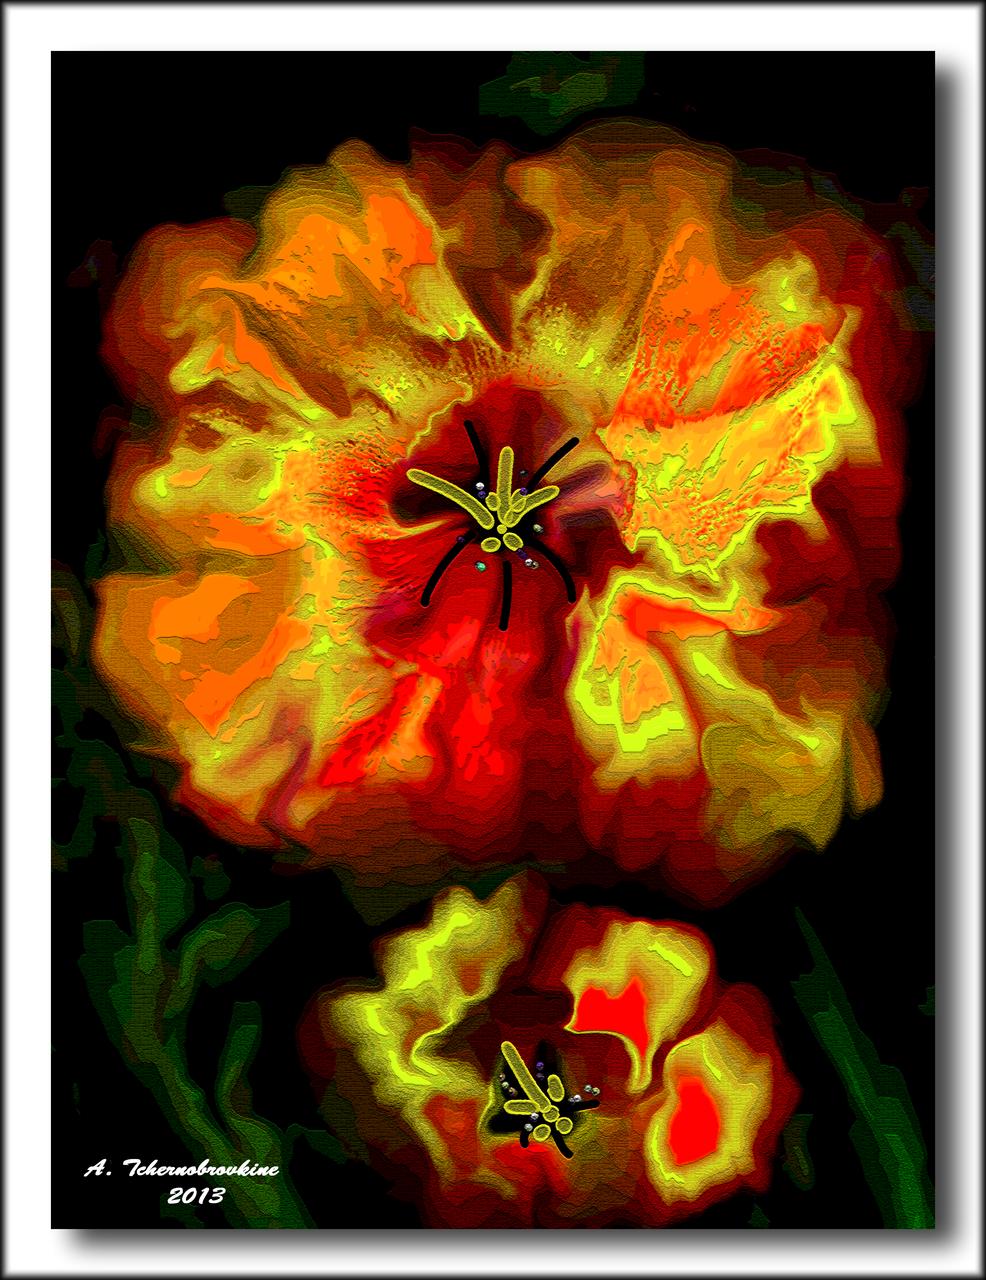 TCHERNOBROVKINE Alexandre Fleurs de Juin n° 5